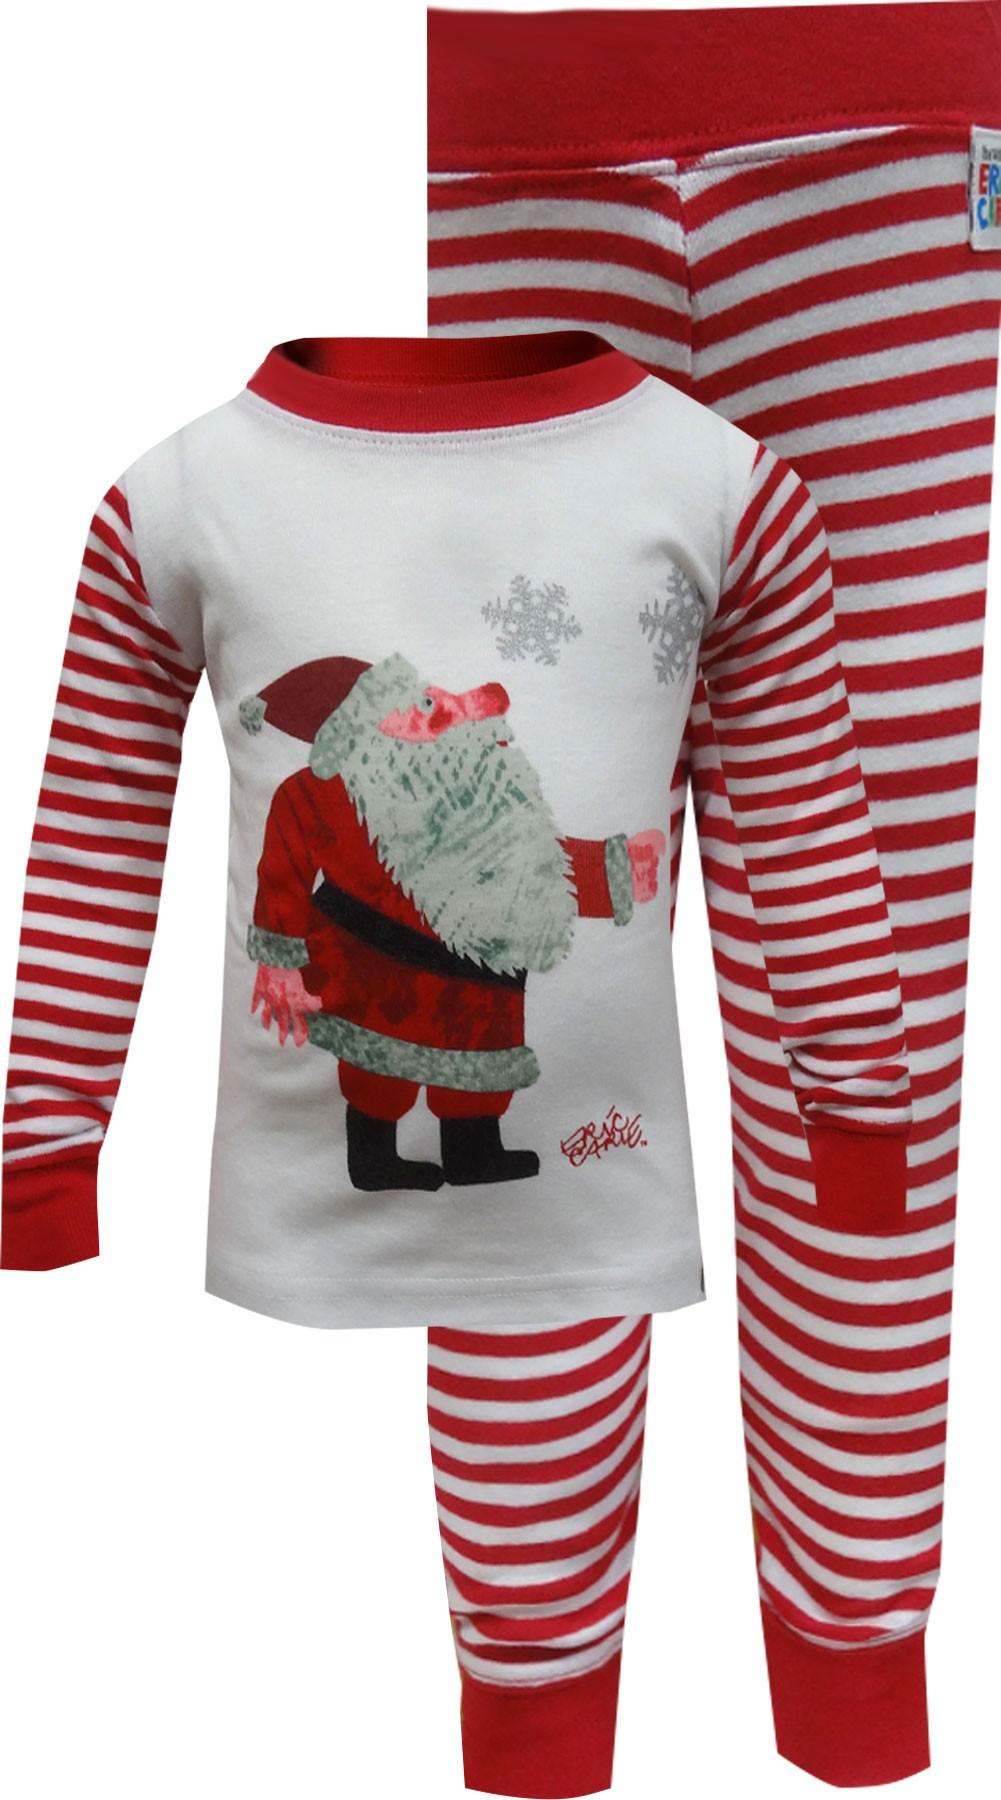 Image of Eric Carle Santa Toddler Christmas Pajama for boys